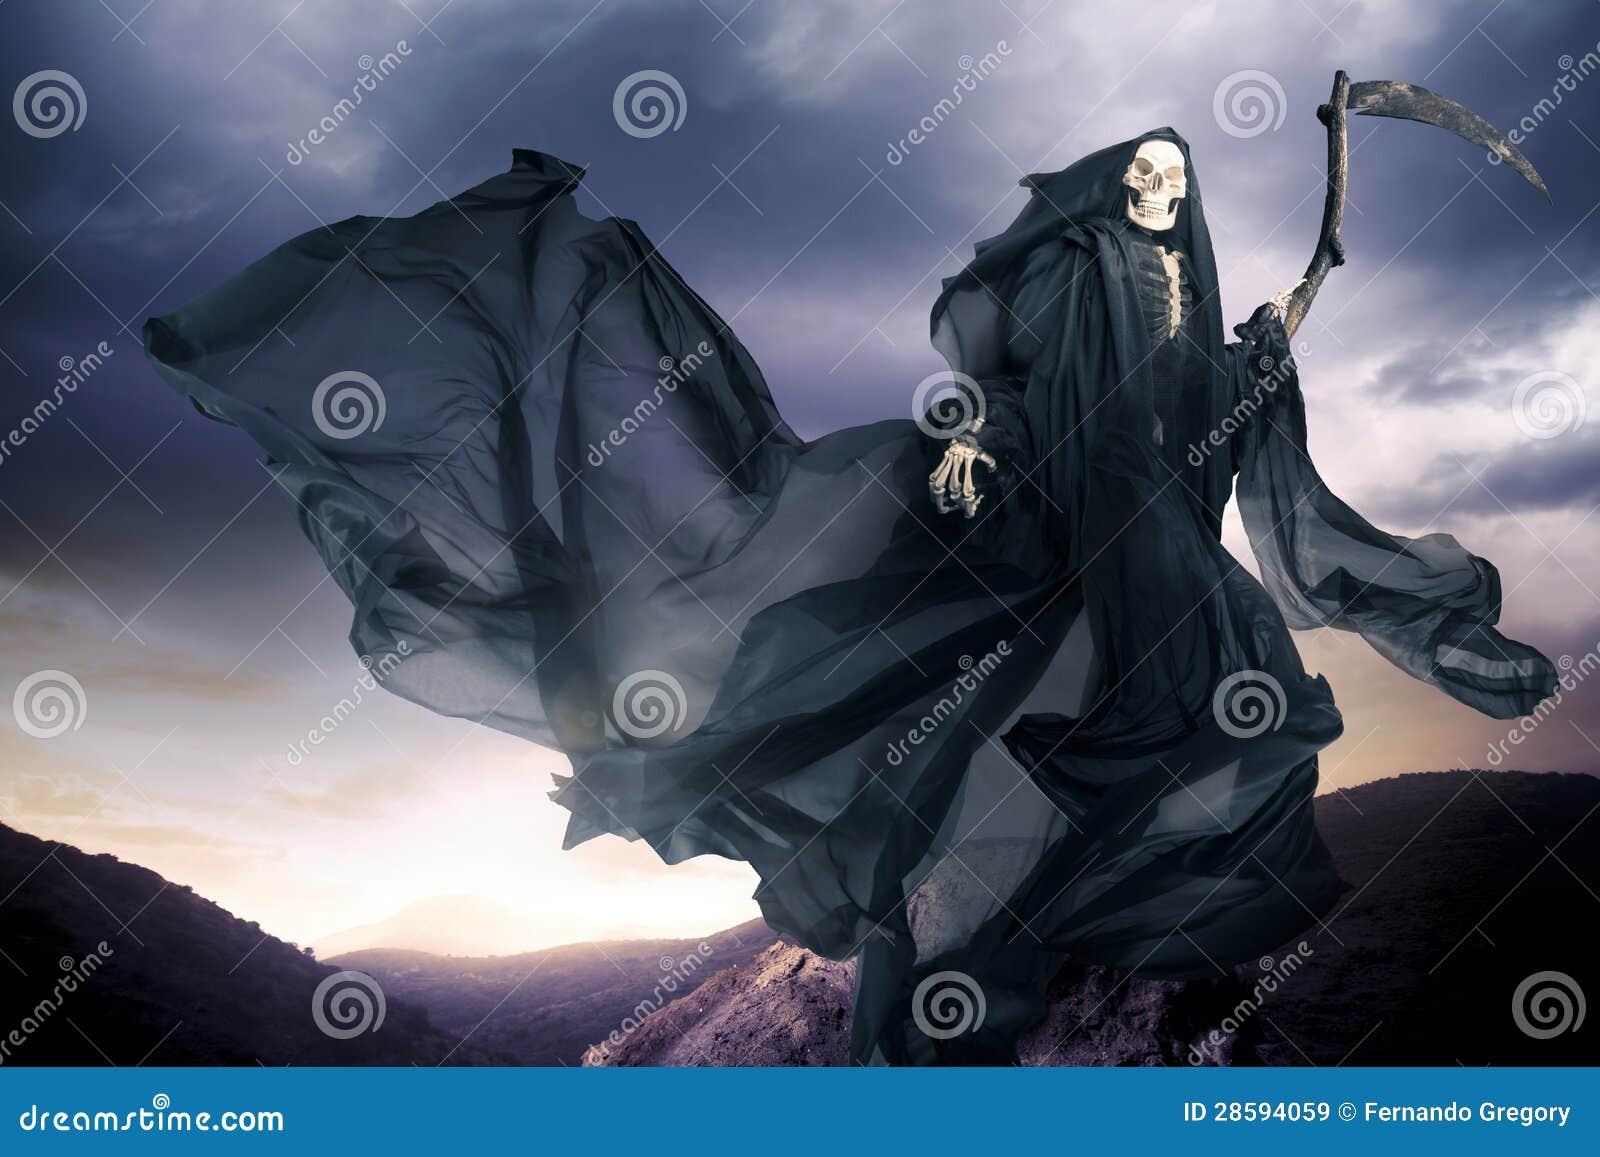 Grim reaper/ angel of death